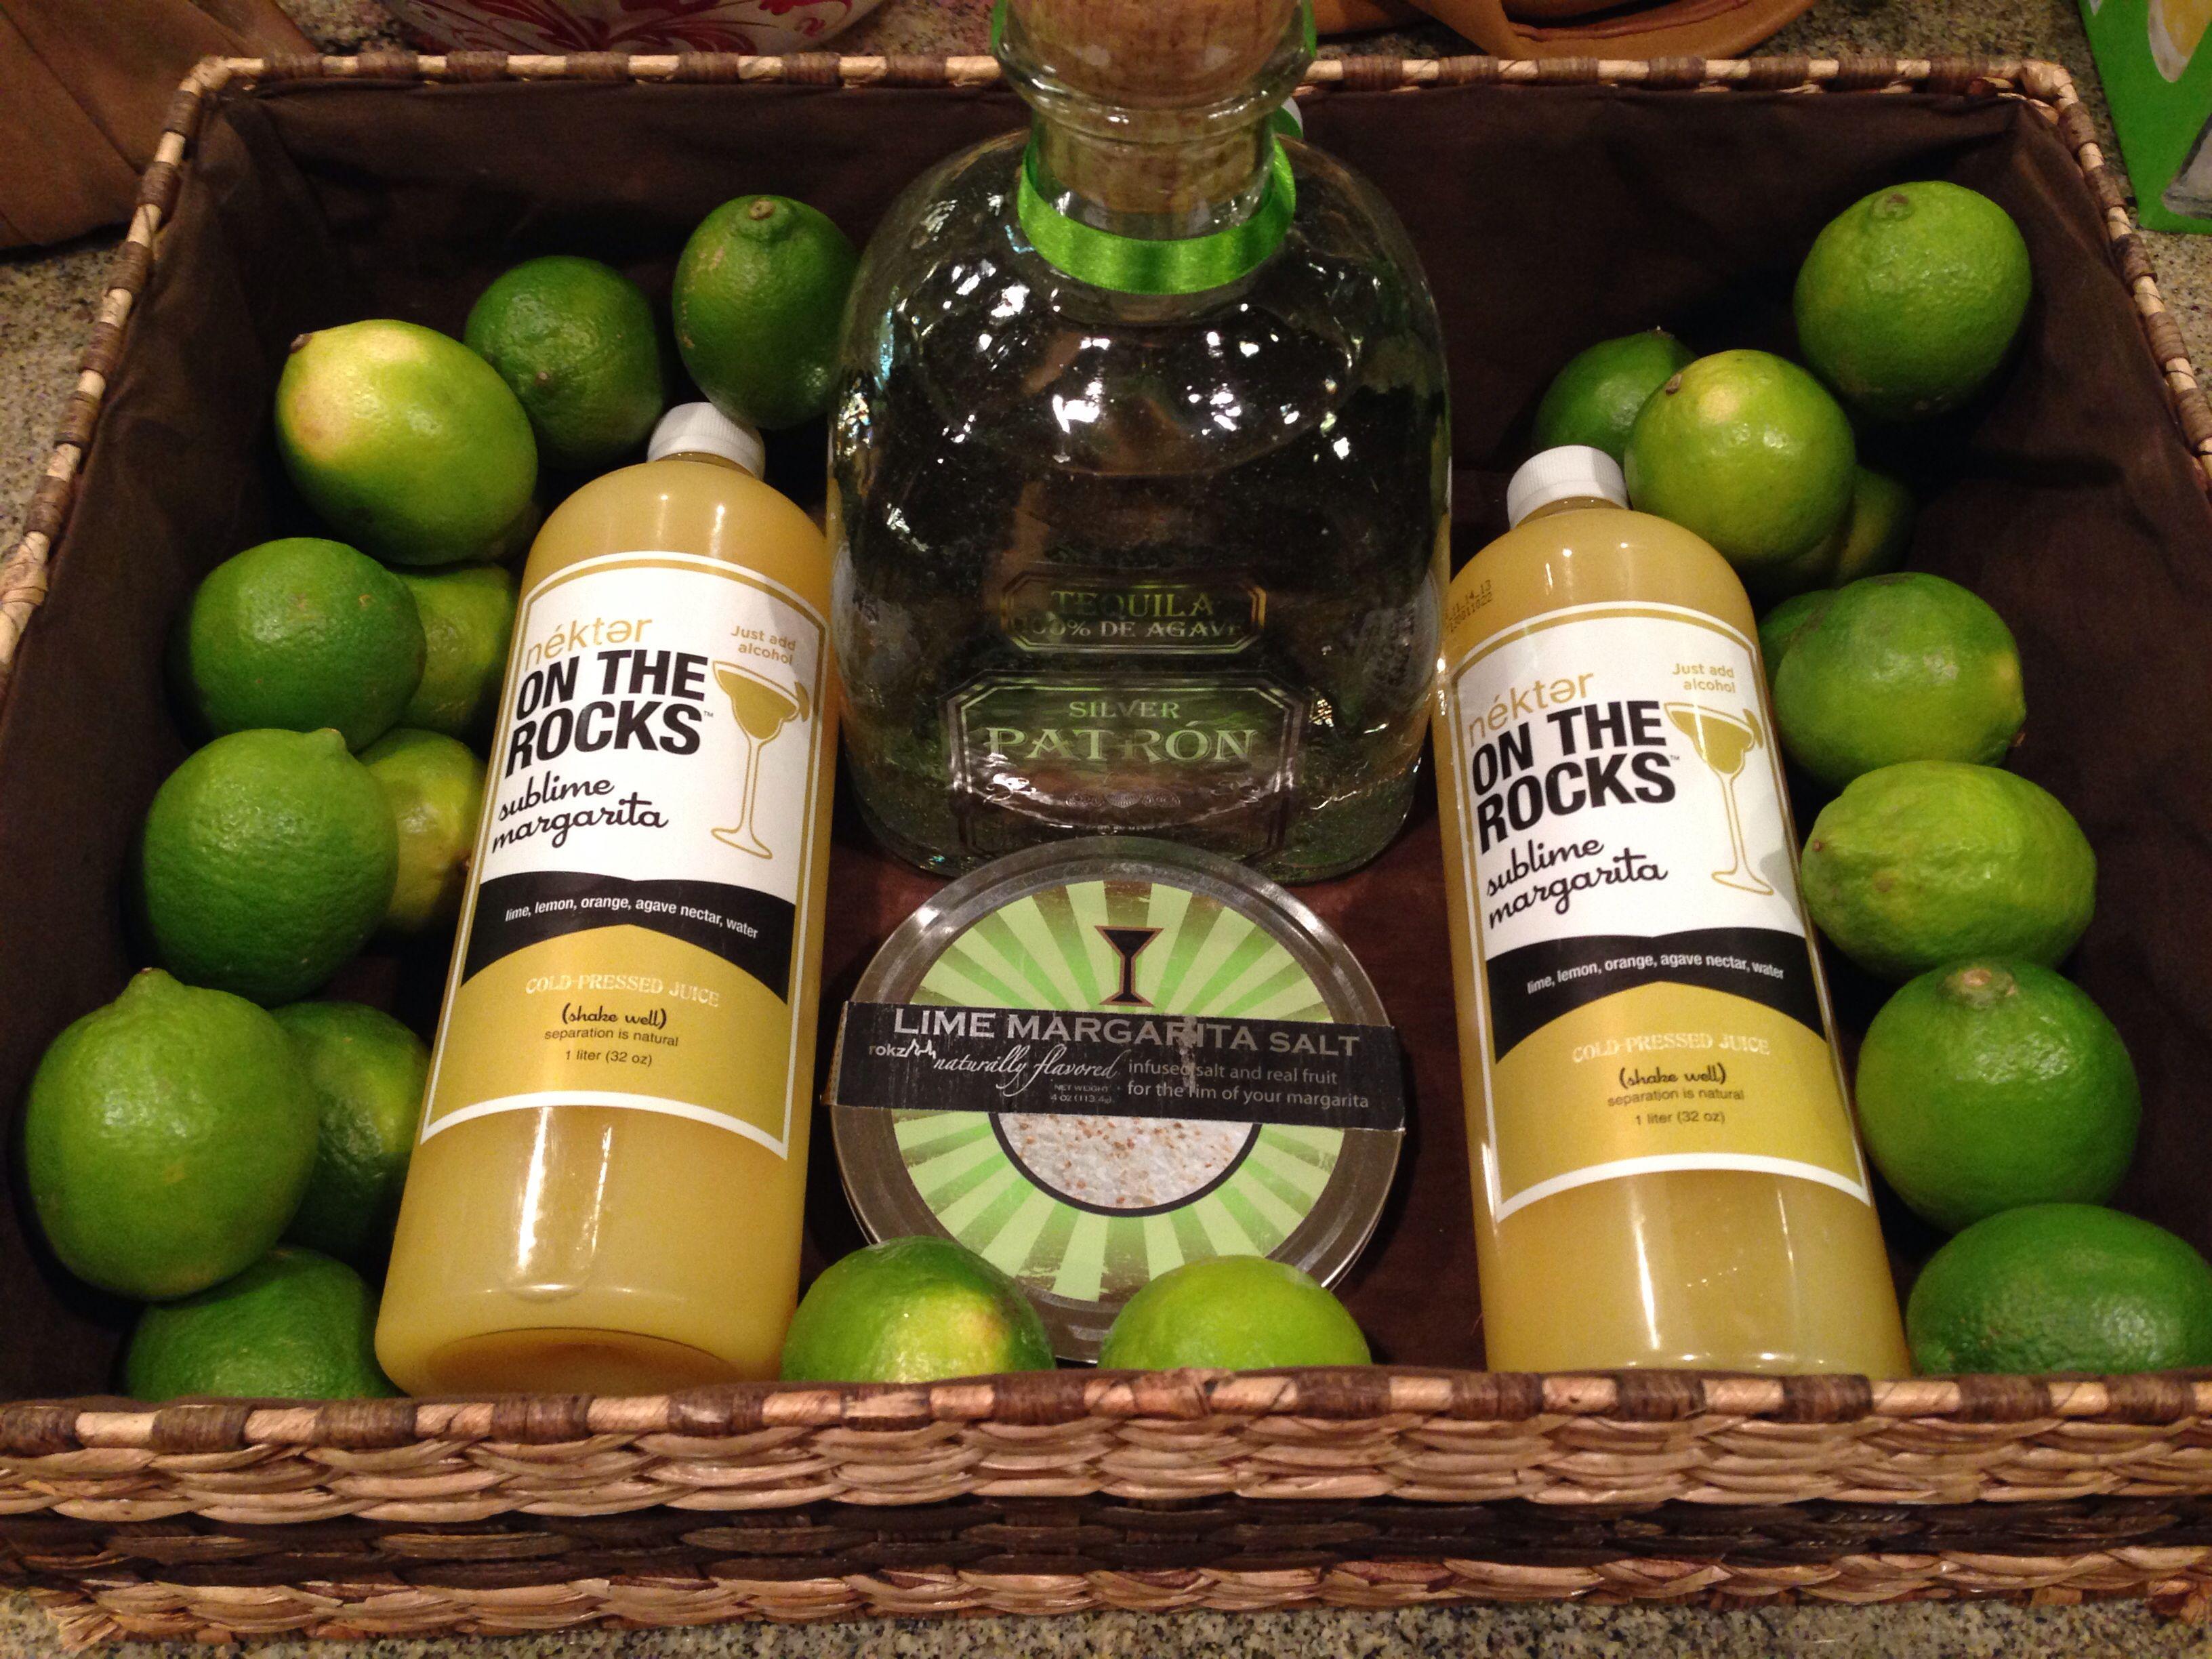 Skinny margarita gift basket - nekter juice, patron tequila, salt ...